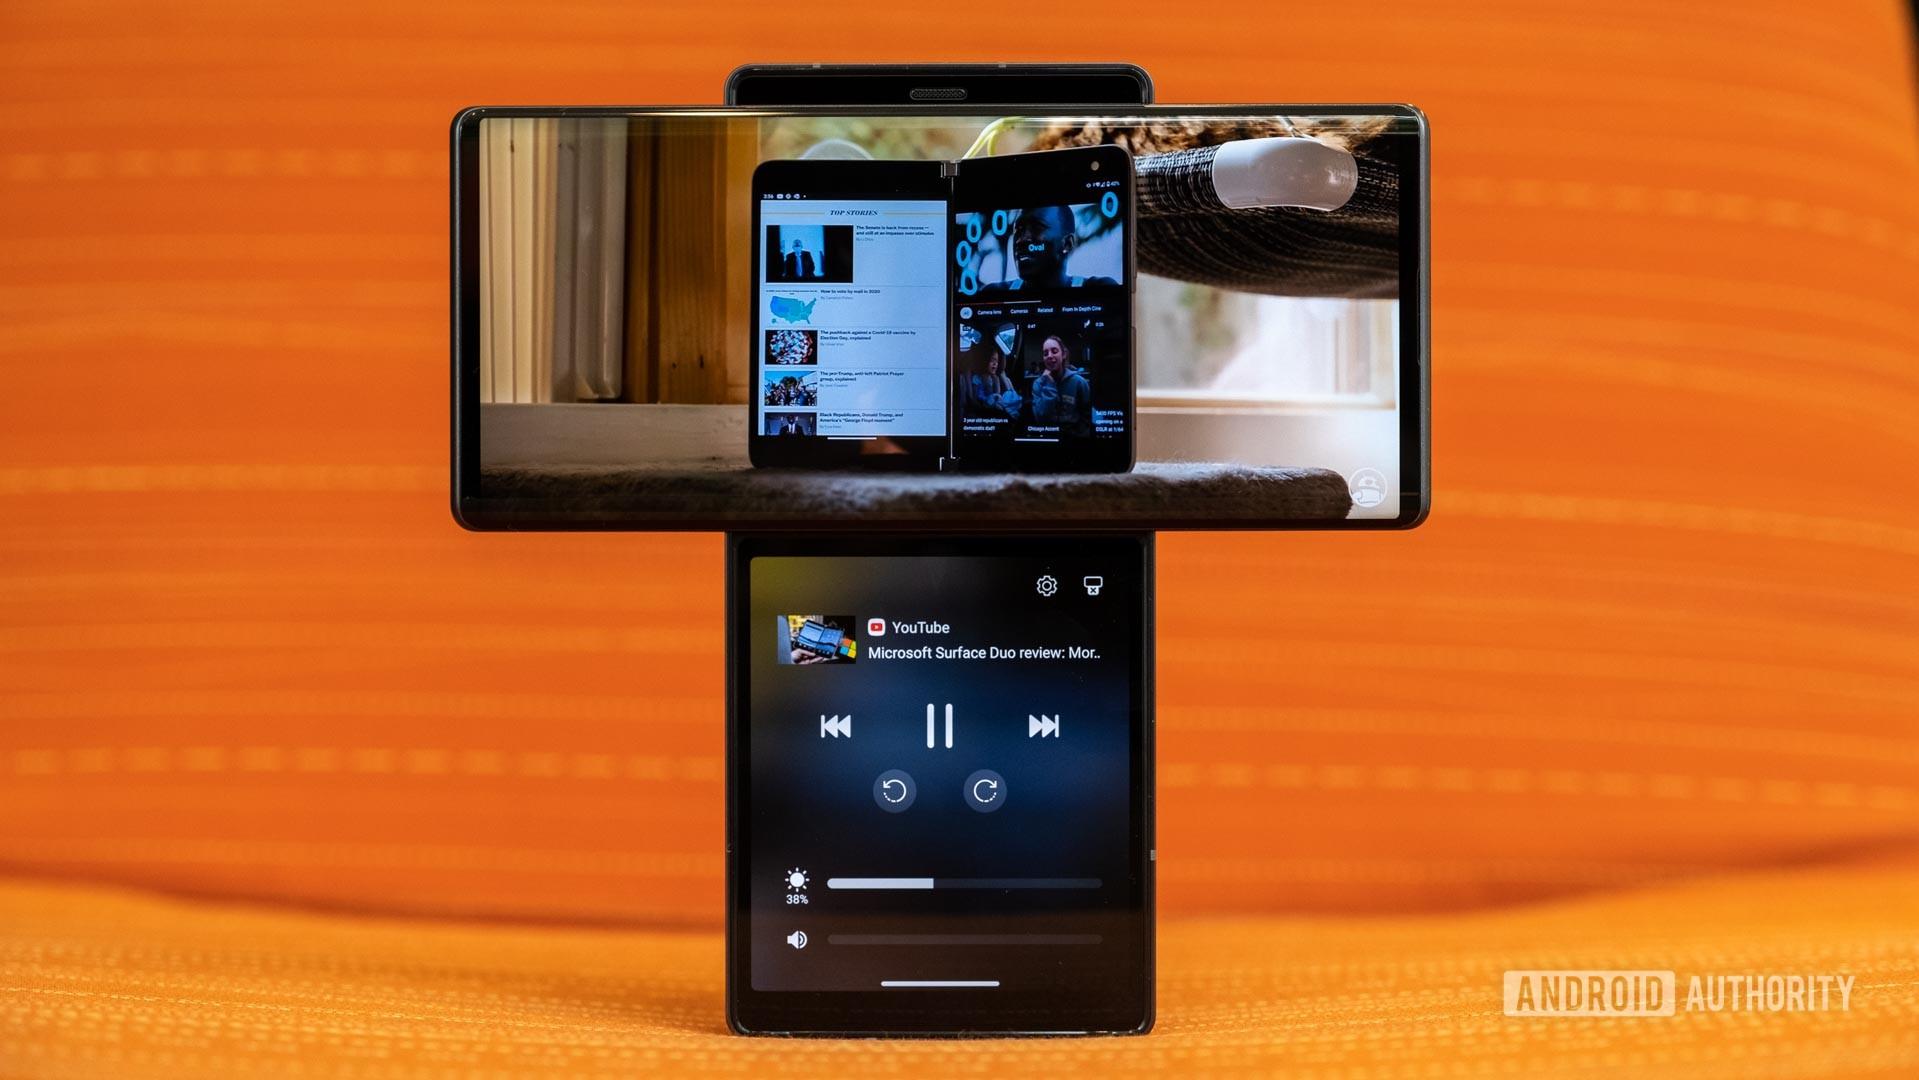 LG Wing YouTube Dual Screen interface 2